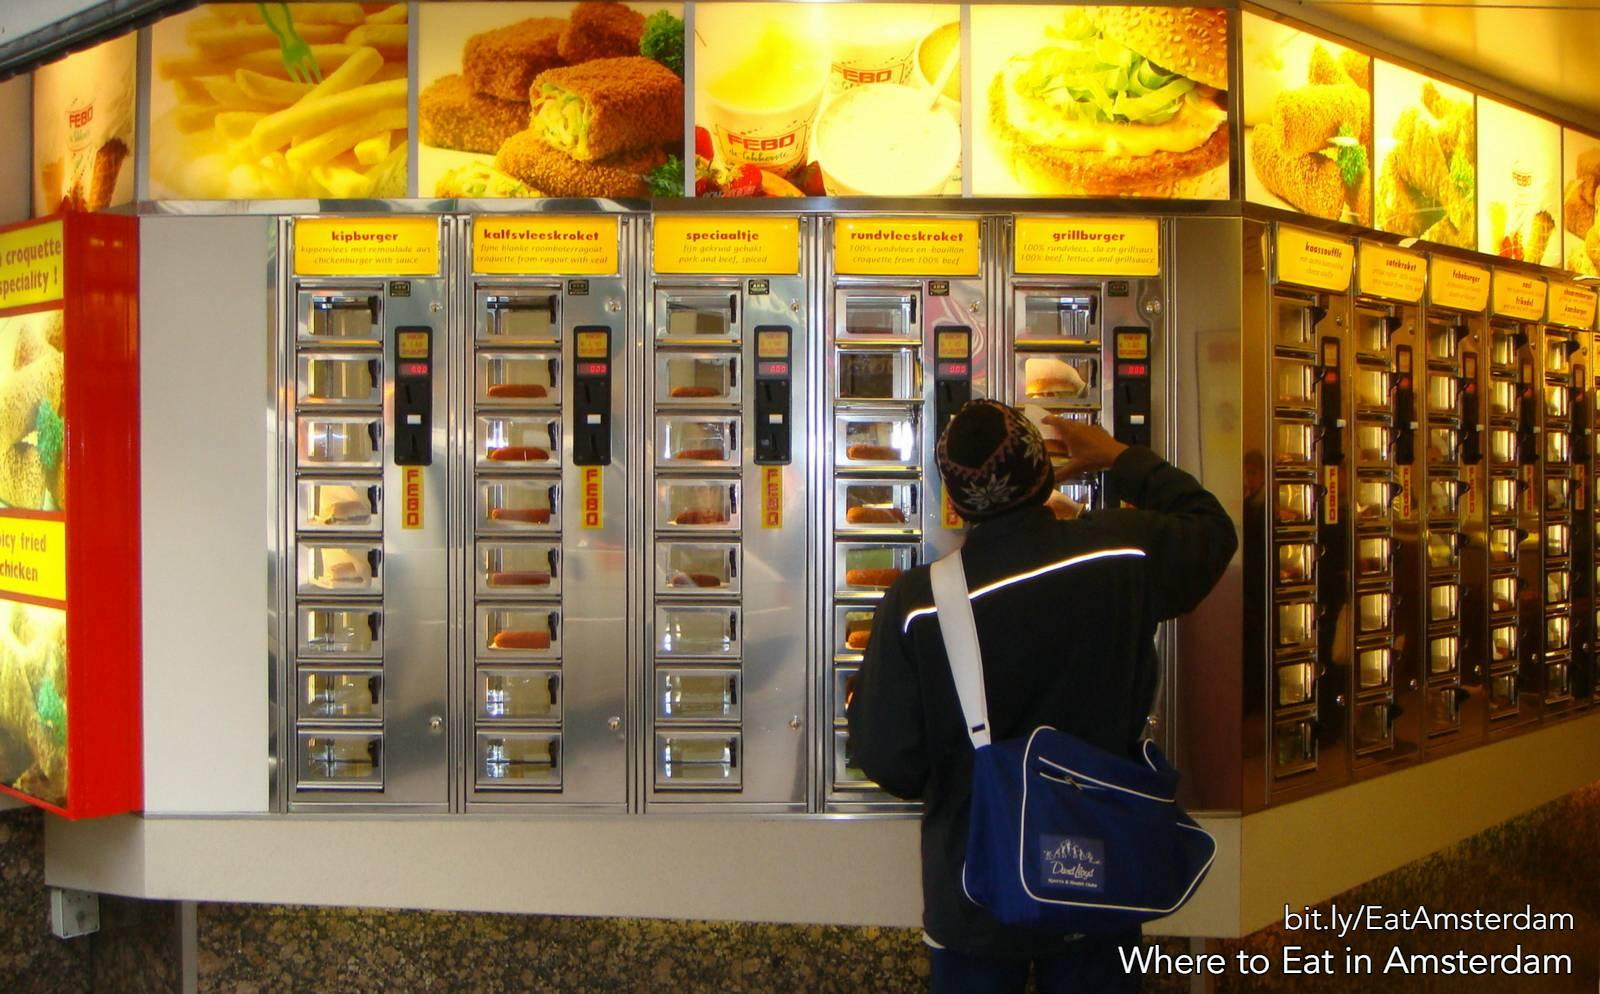 amsterdam FEBO fast food